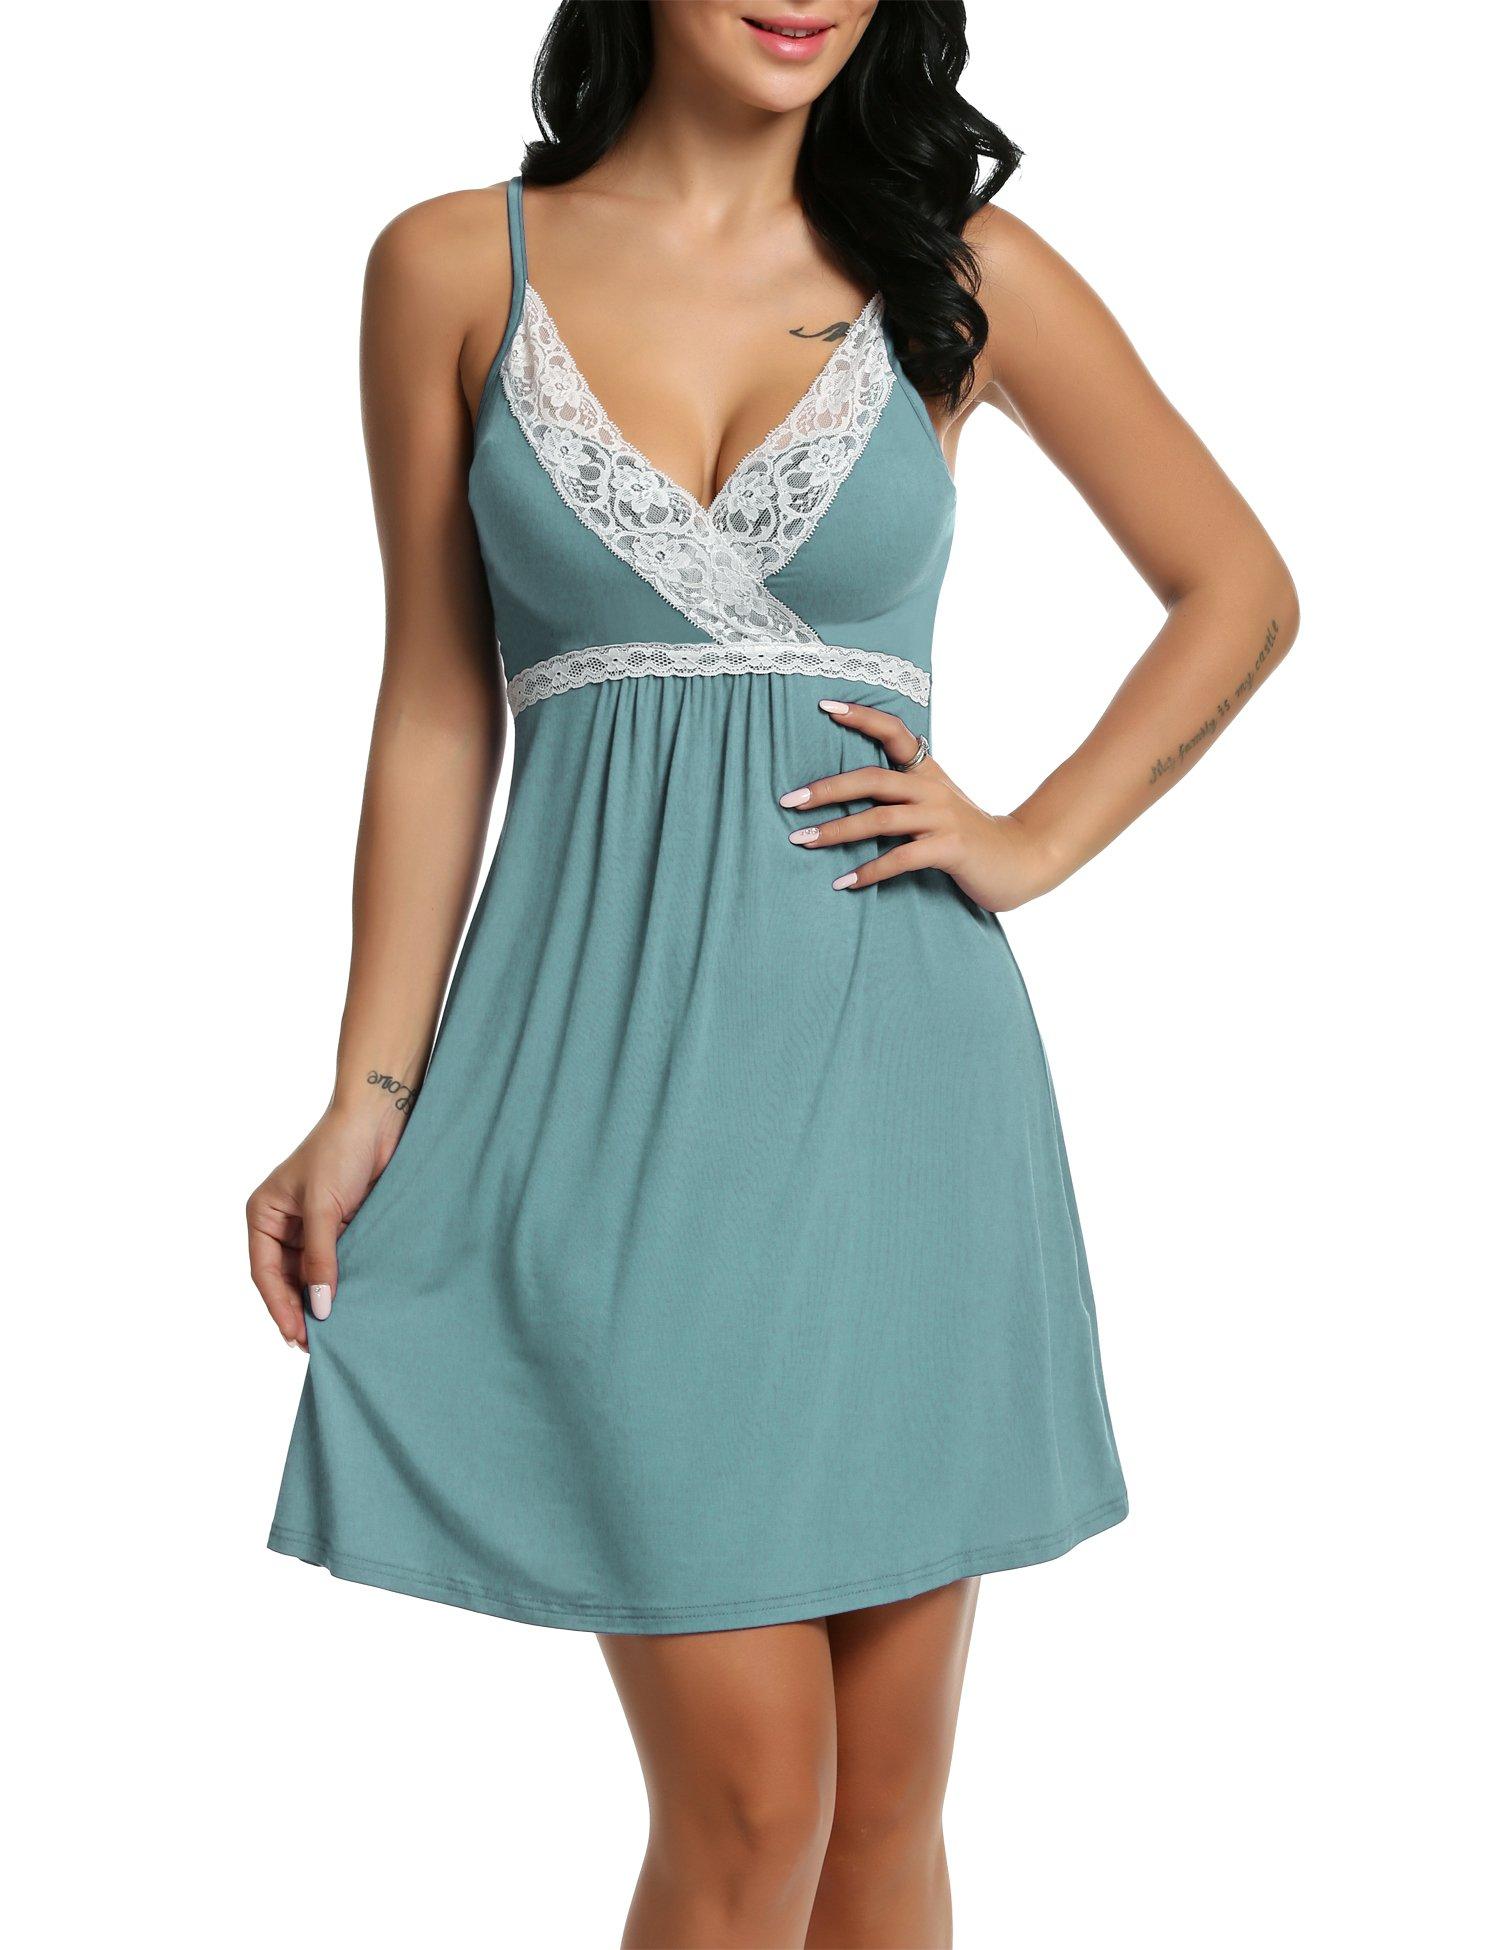 de7f48fc530 Galleon - Hotouch Women s Satin Camisole Nightgown Classic Chemise Slip  Sleepwear Light Green S